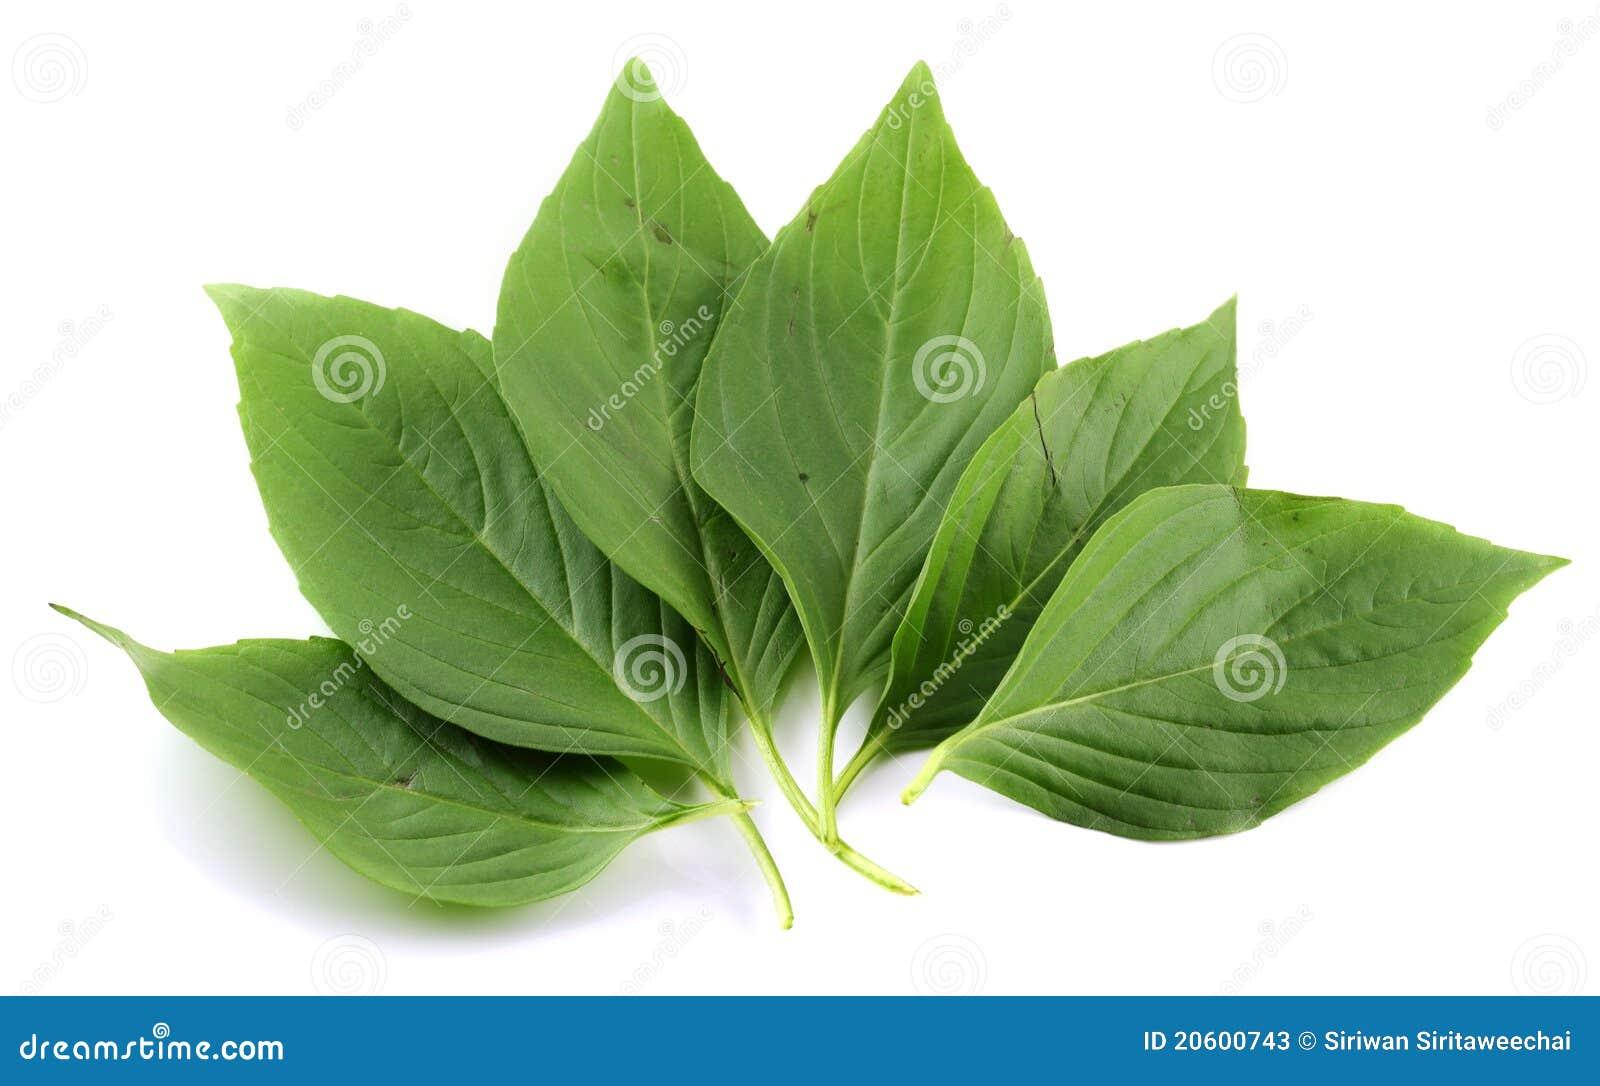 Basil Leaf Stock Photos - Image: 20600743